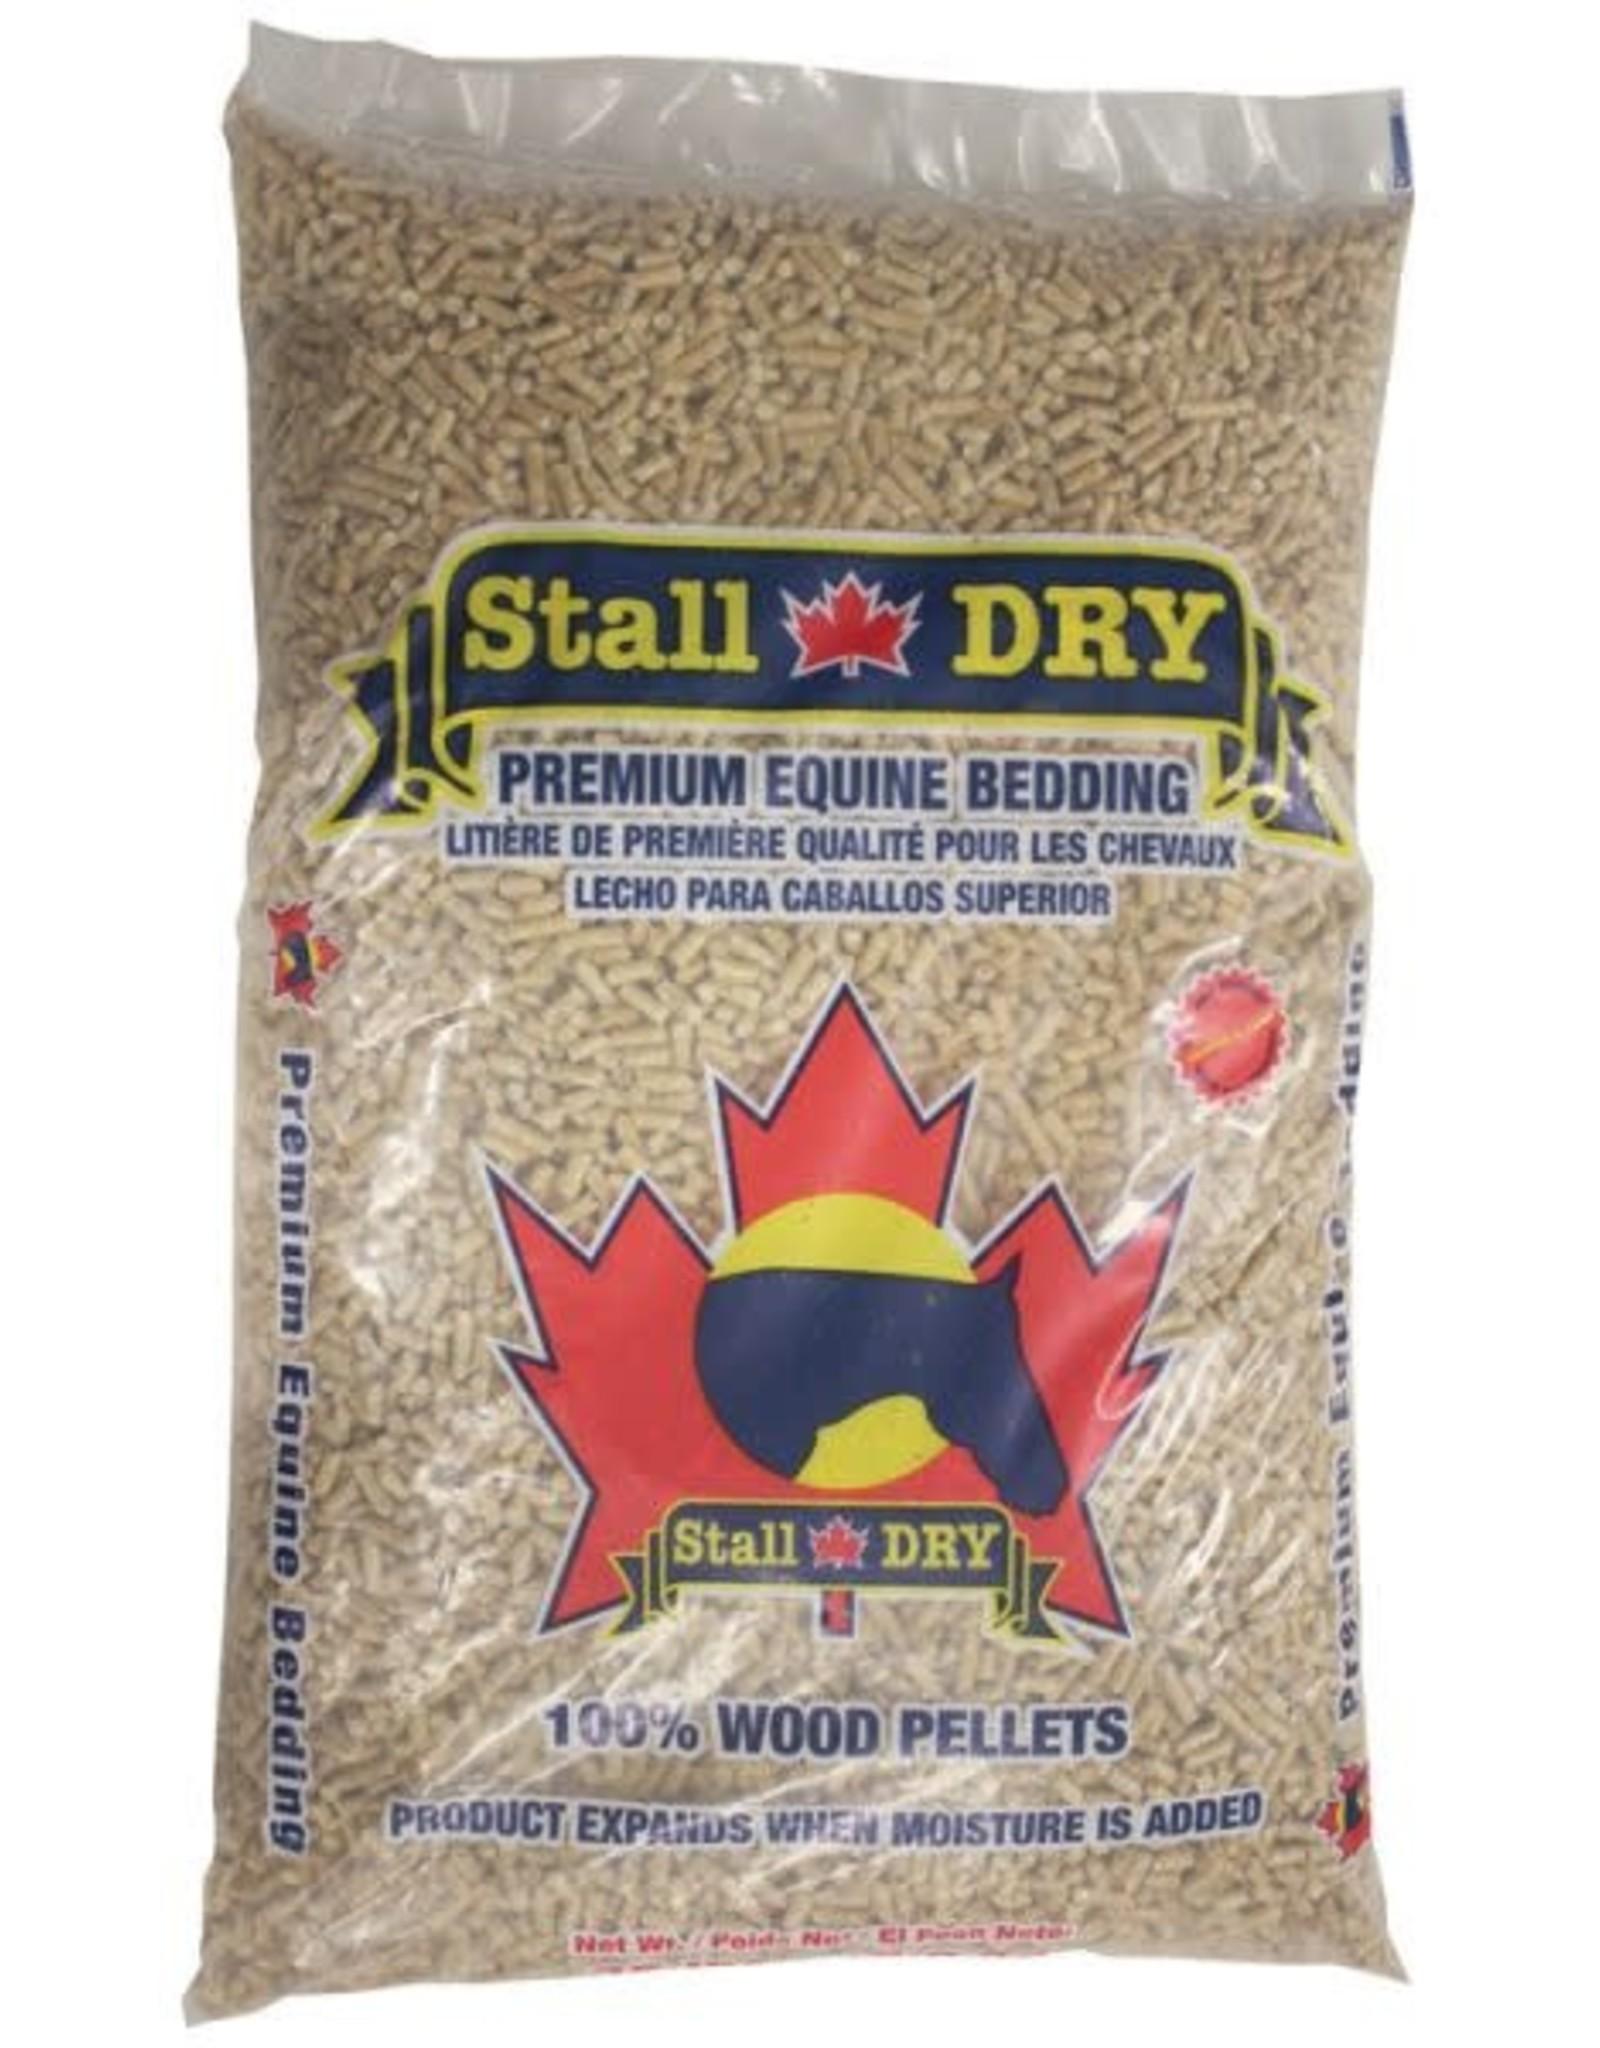 API APL Stall Dry Wood Pellets 16kg